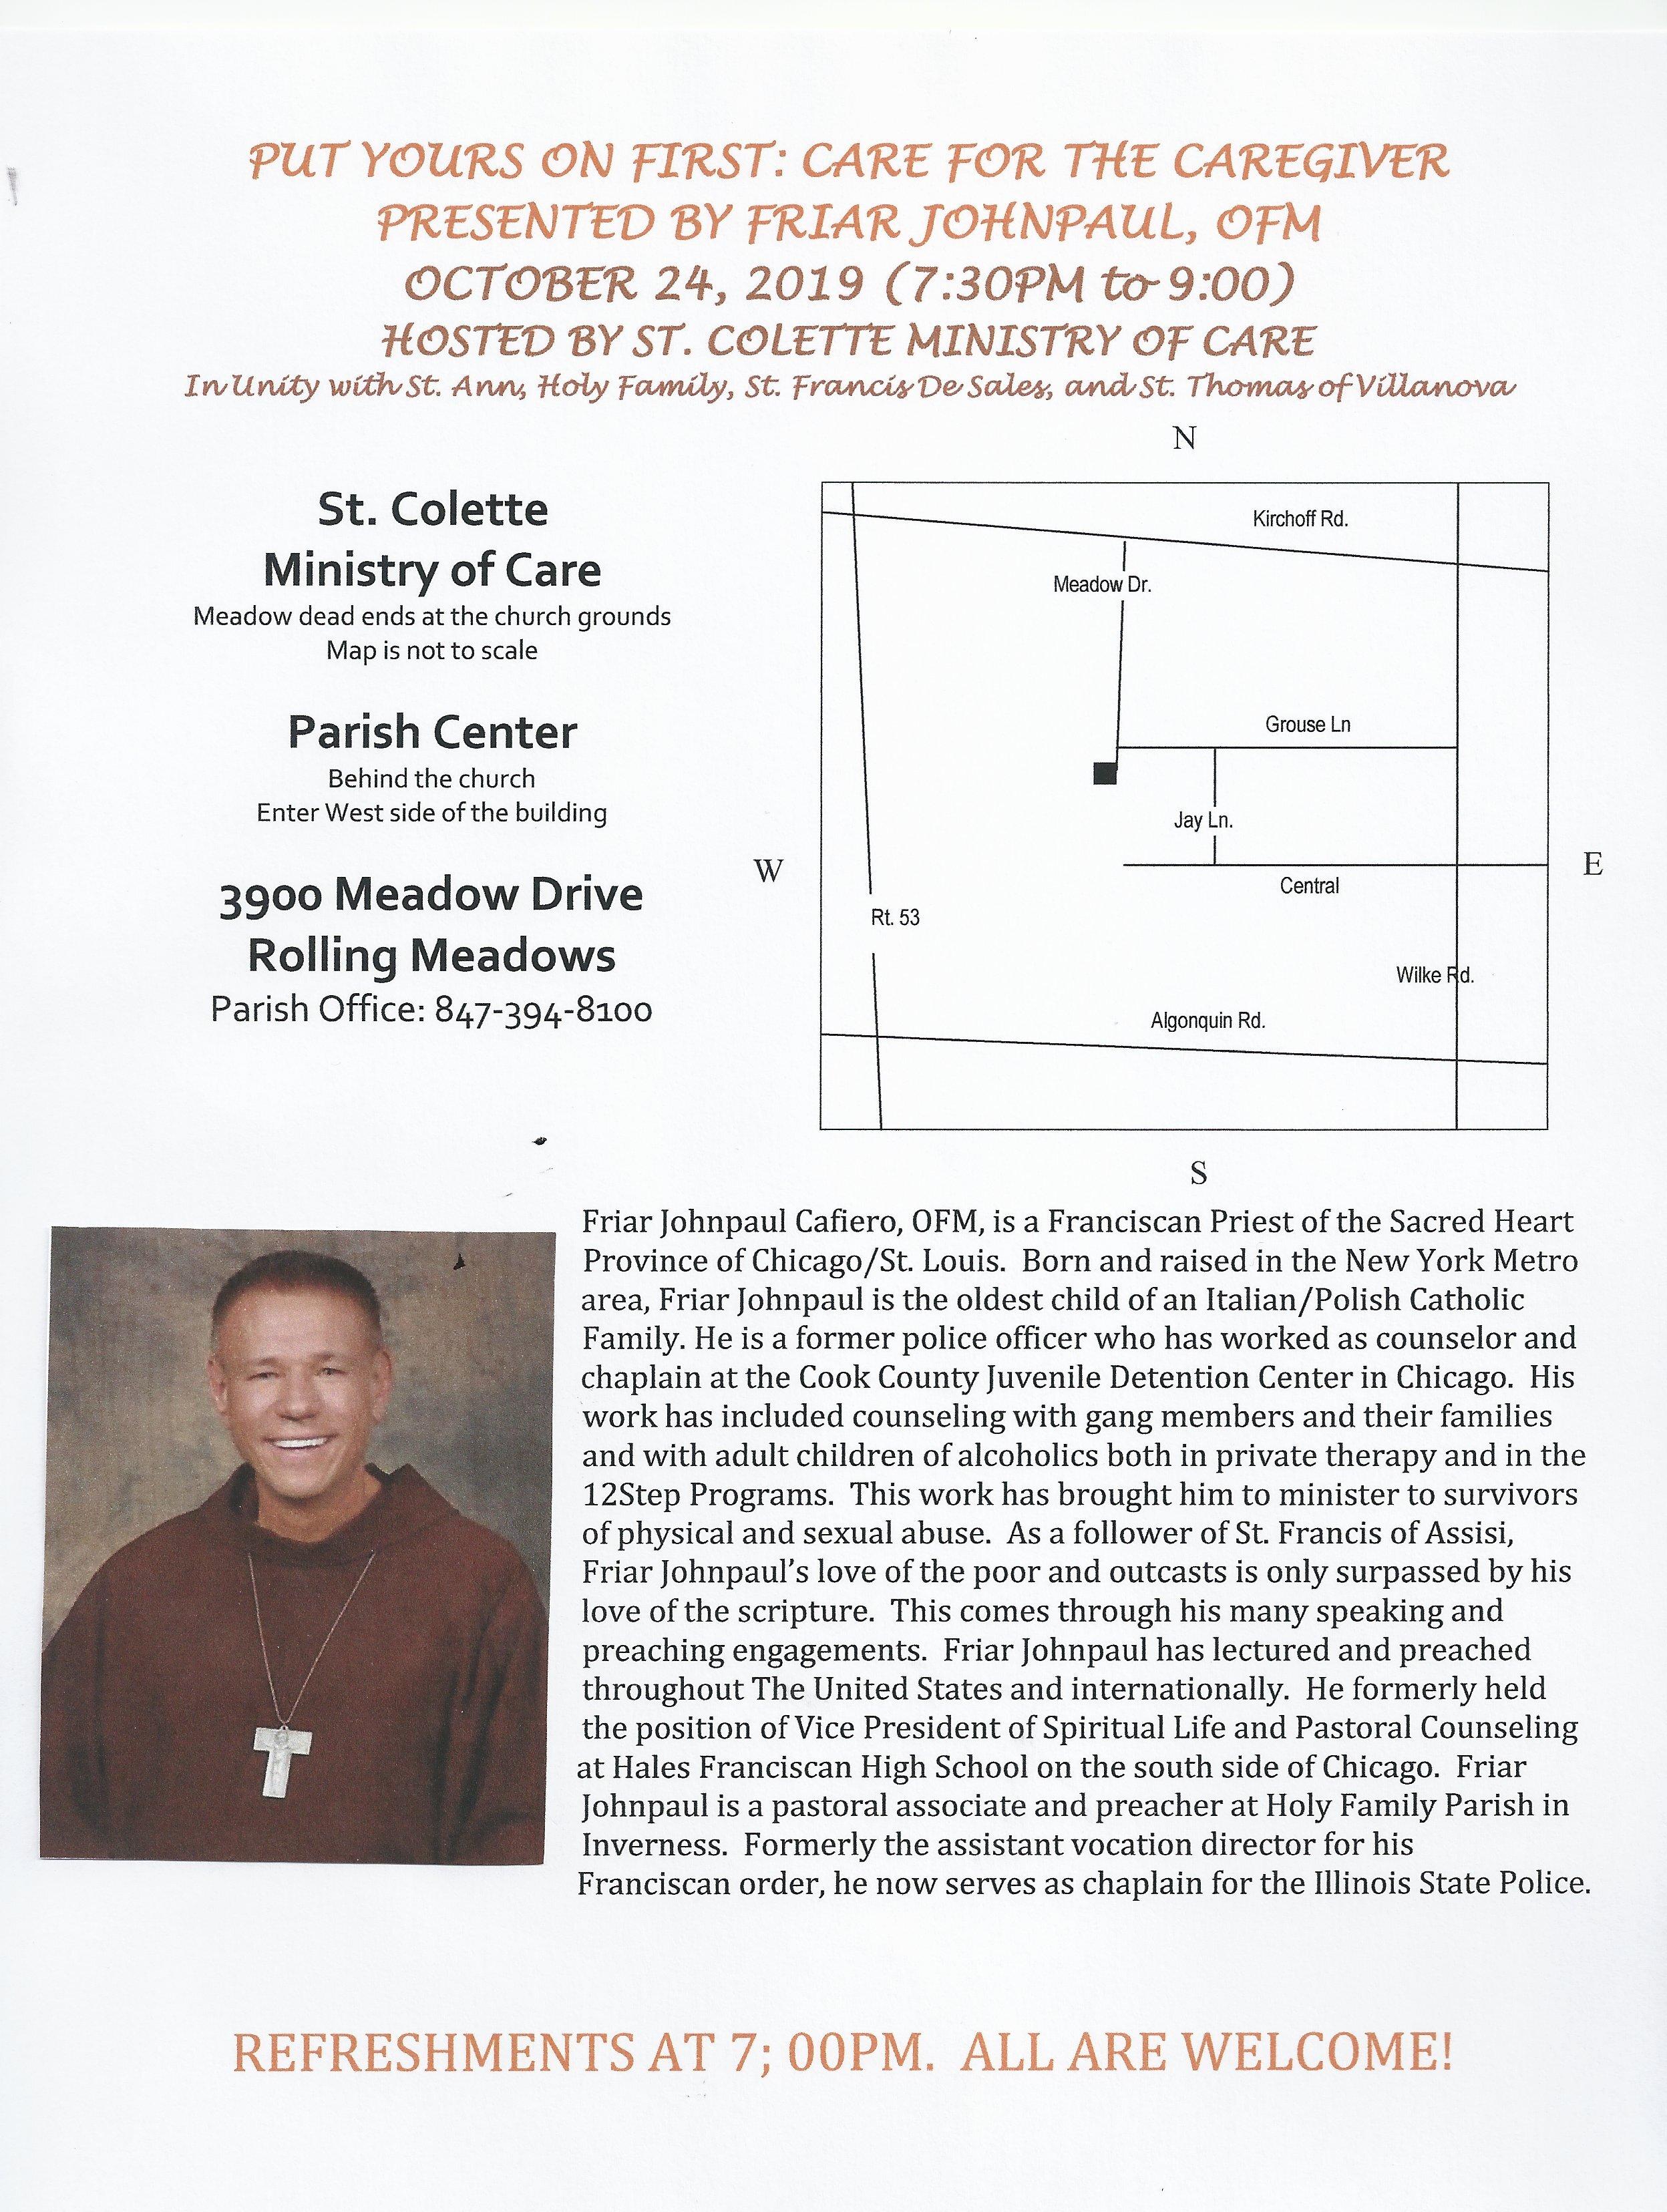 Friar JohnPaul Flyer Oct. 2019.JPG